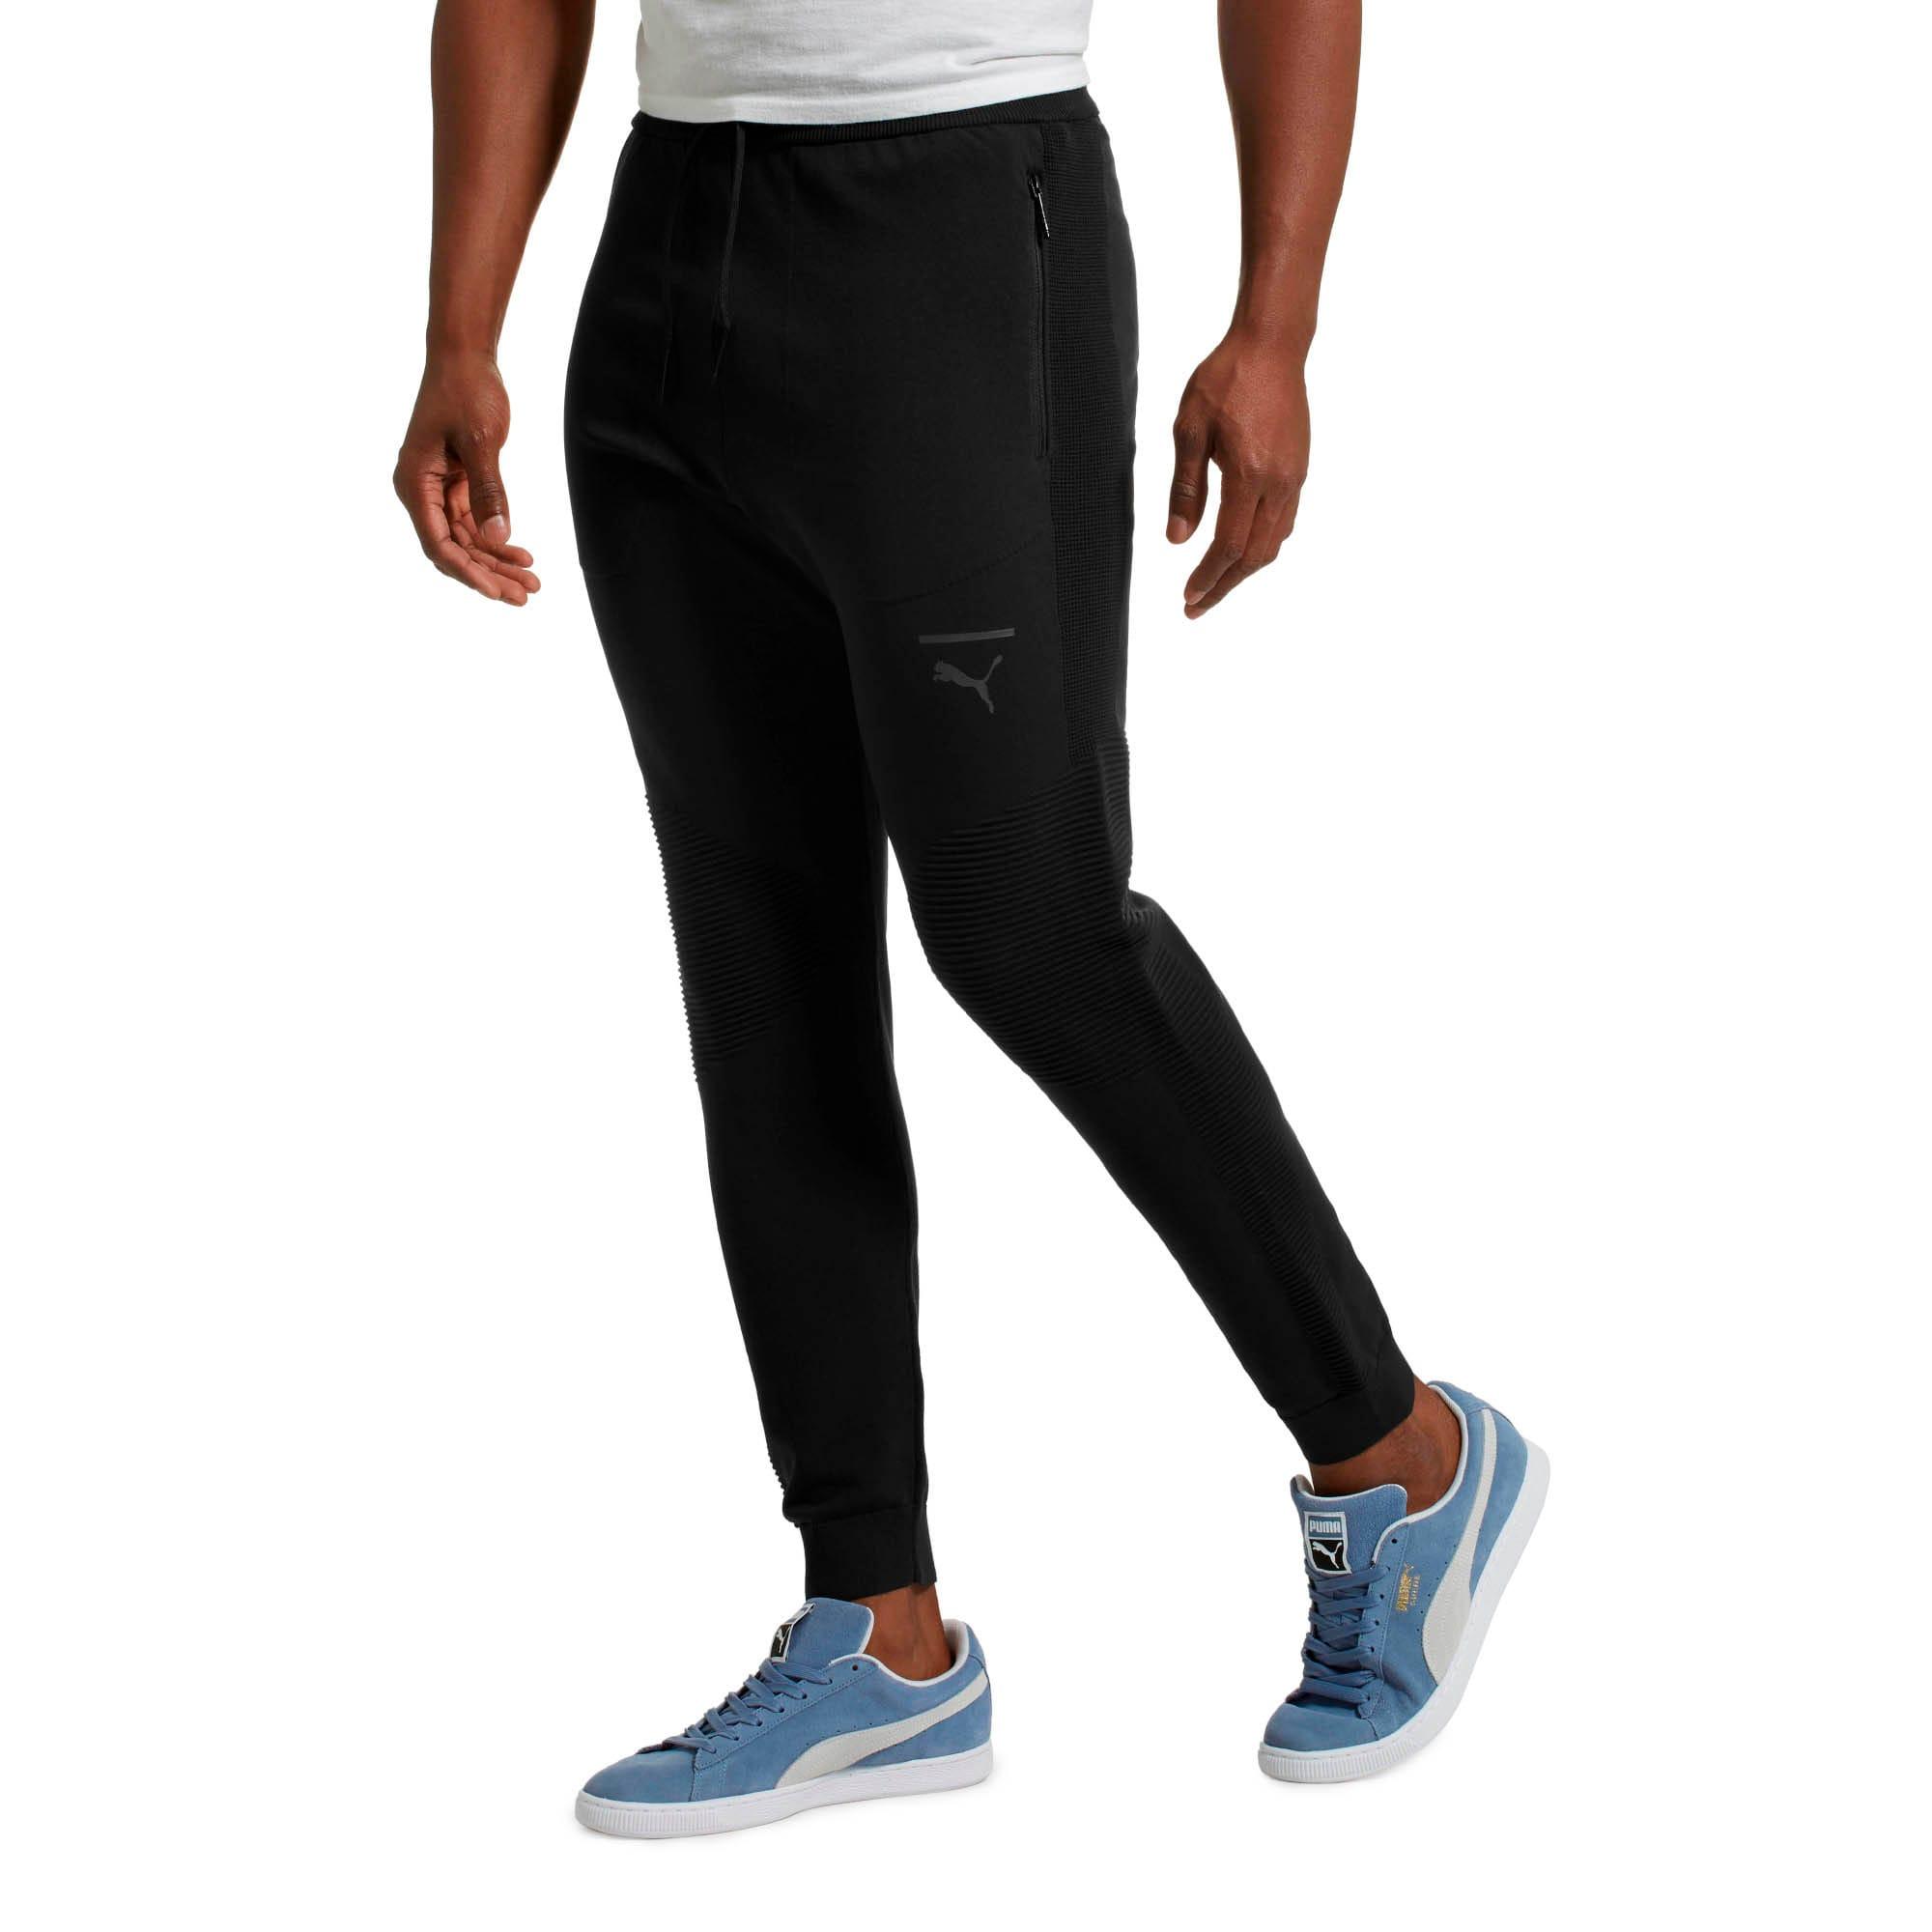 Thumbnail 2 of Pace evoKNIT Move Men's Sweatpants, Puma Black, medium